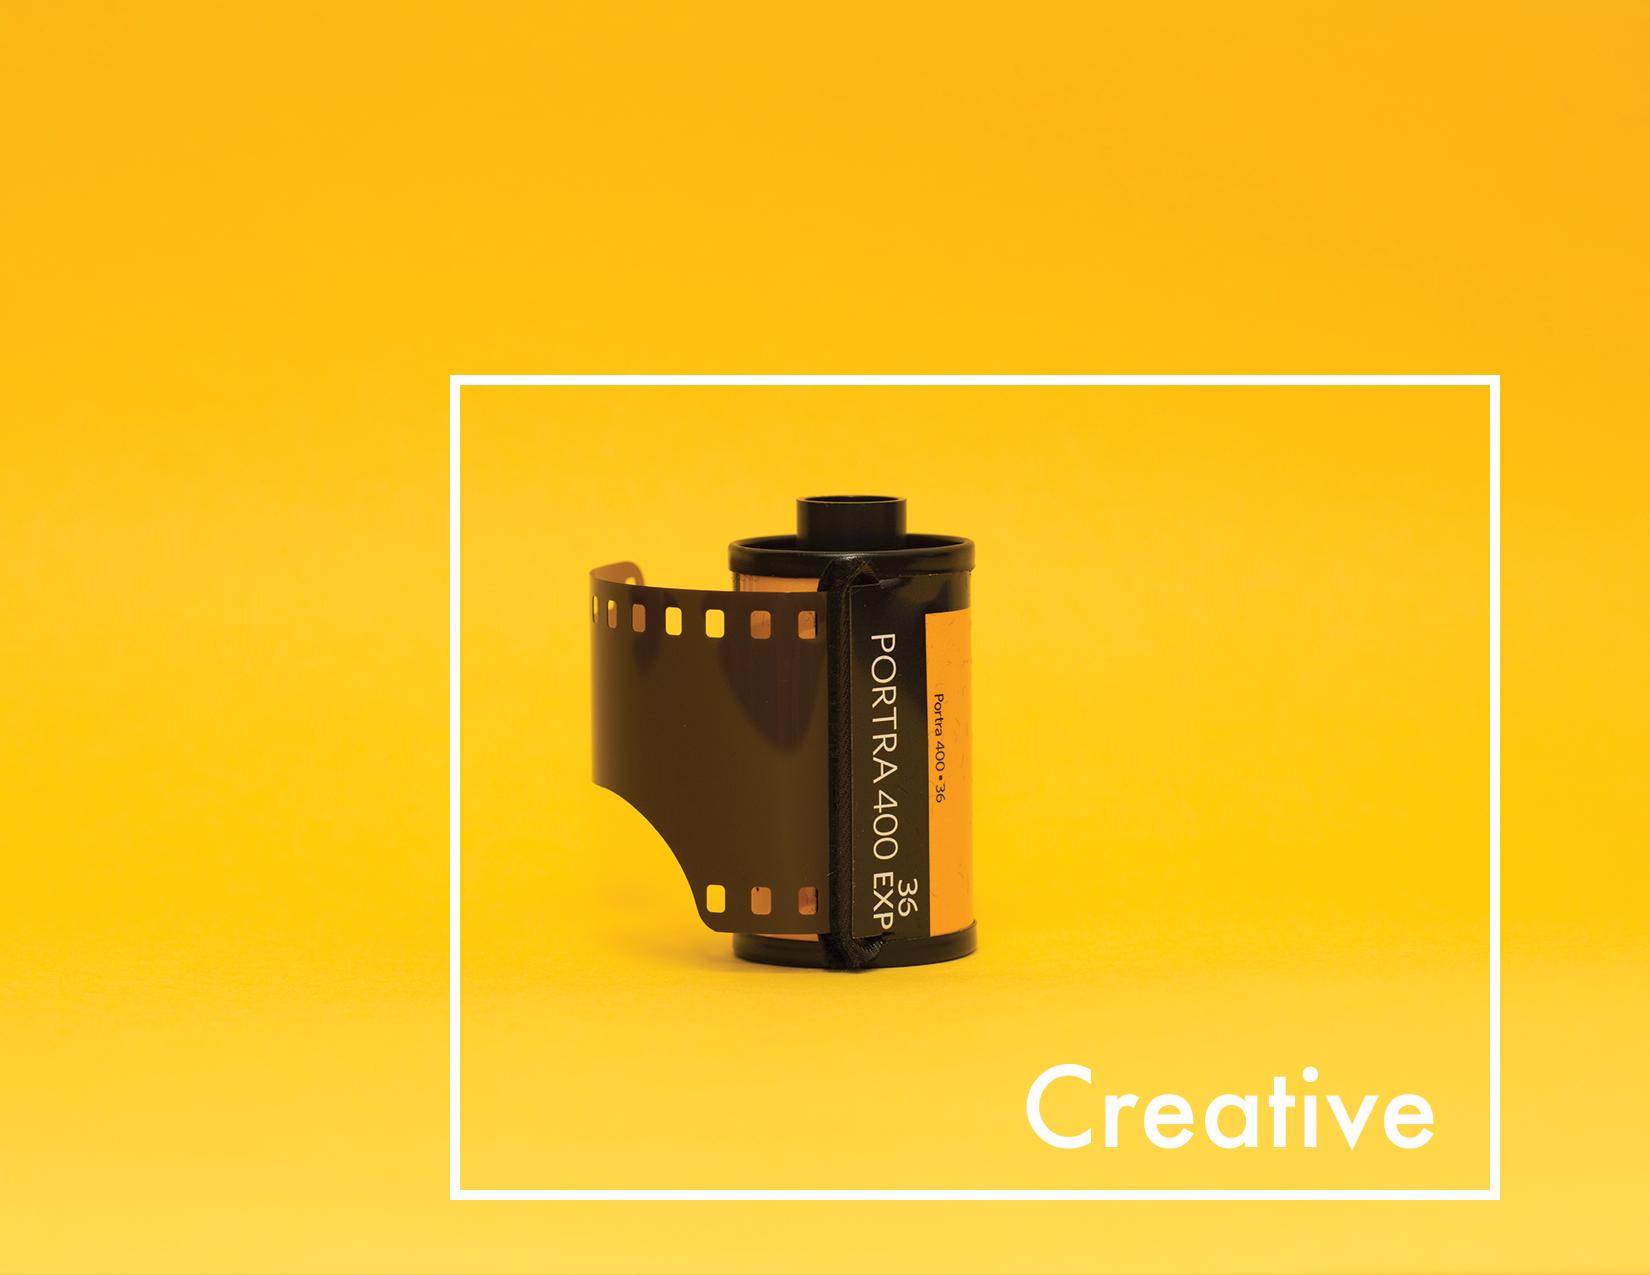 creativev2.png